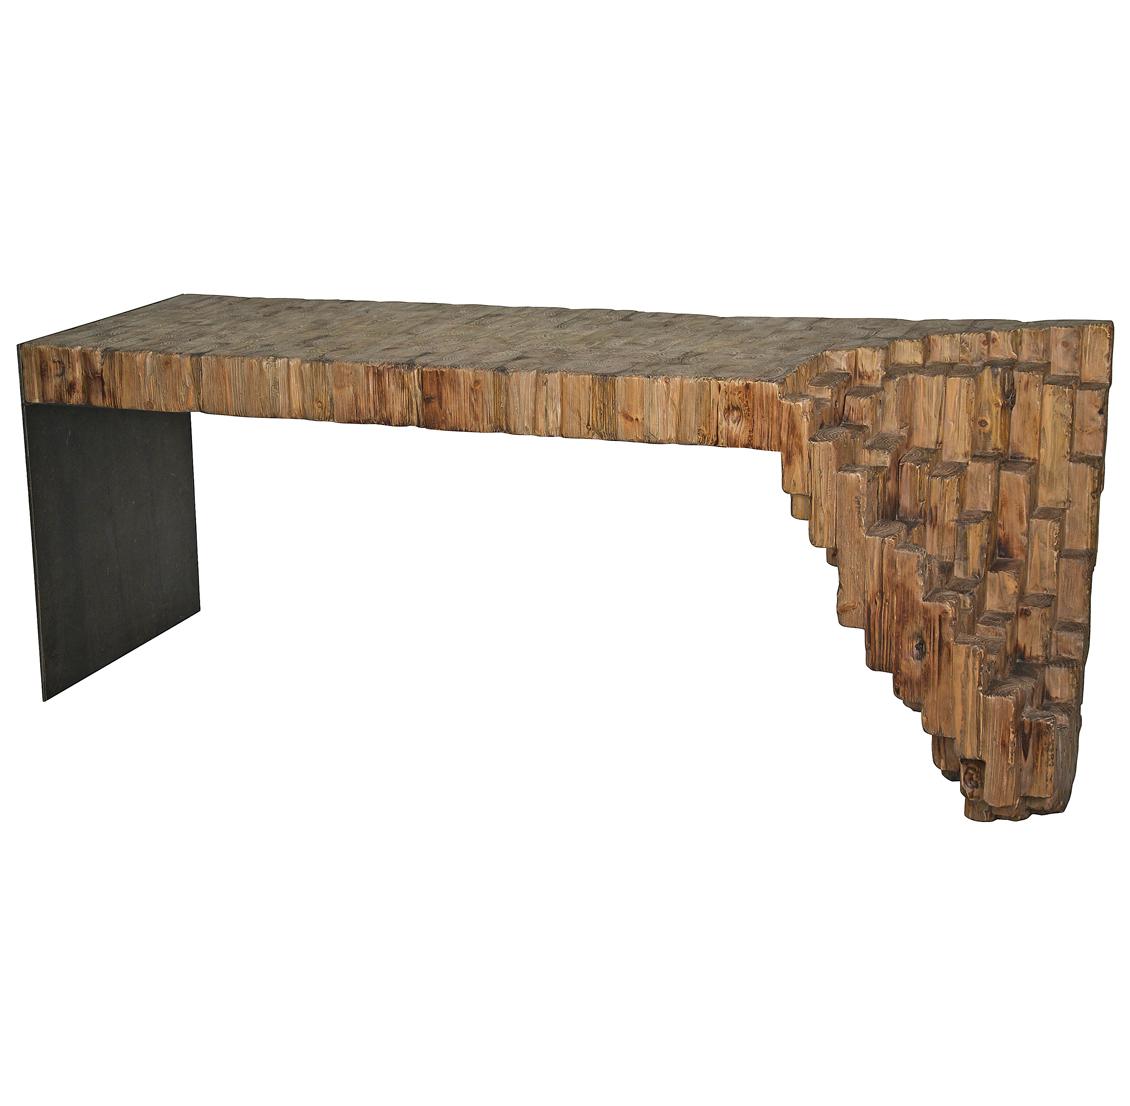 Lassi Global Bazaar Sculptural Reclaimed Wood Metal Console Table